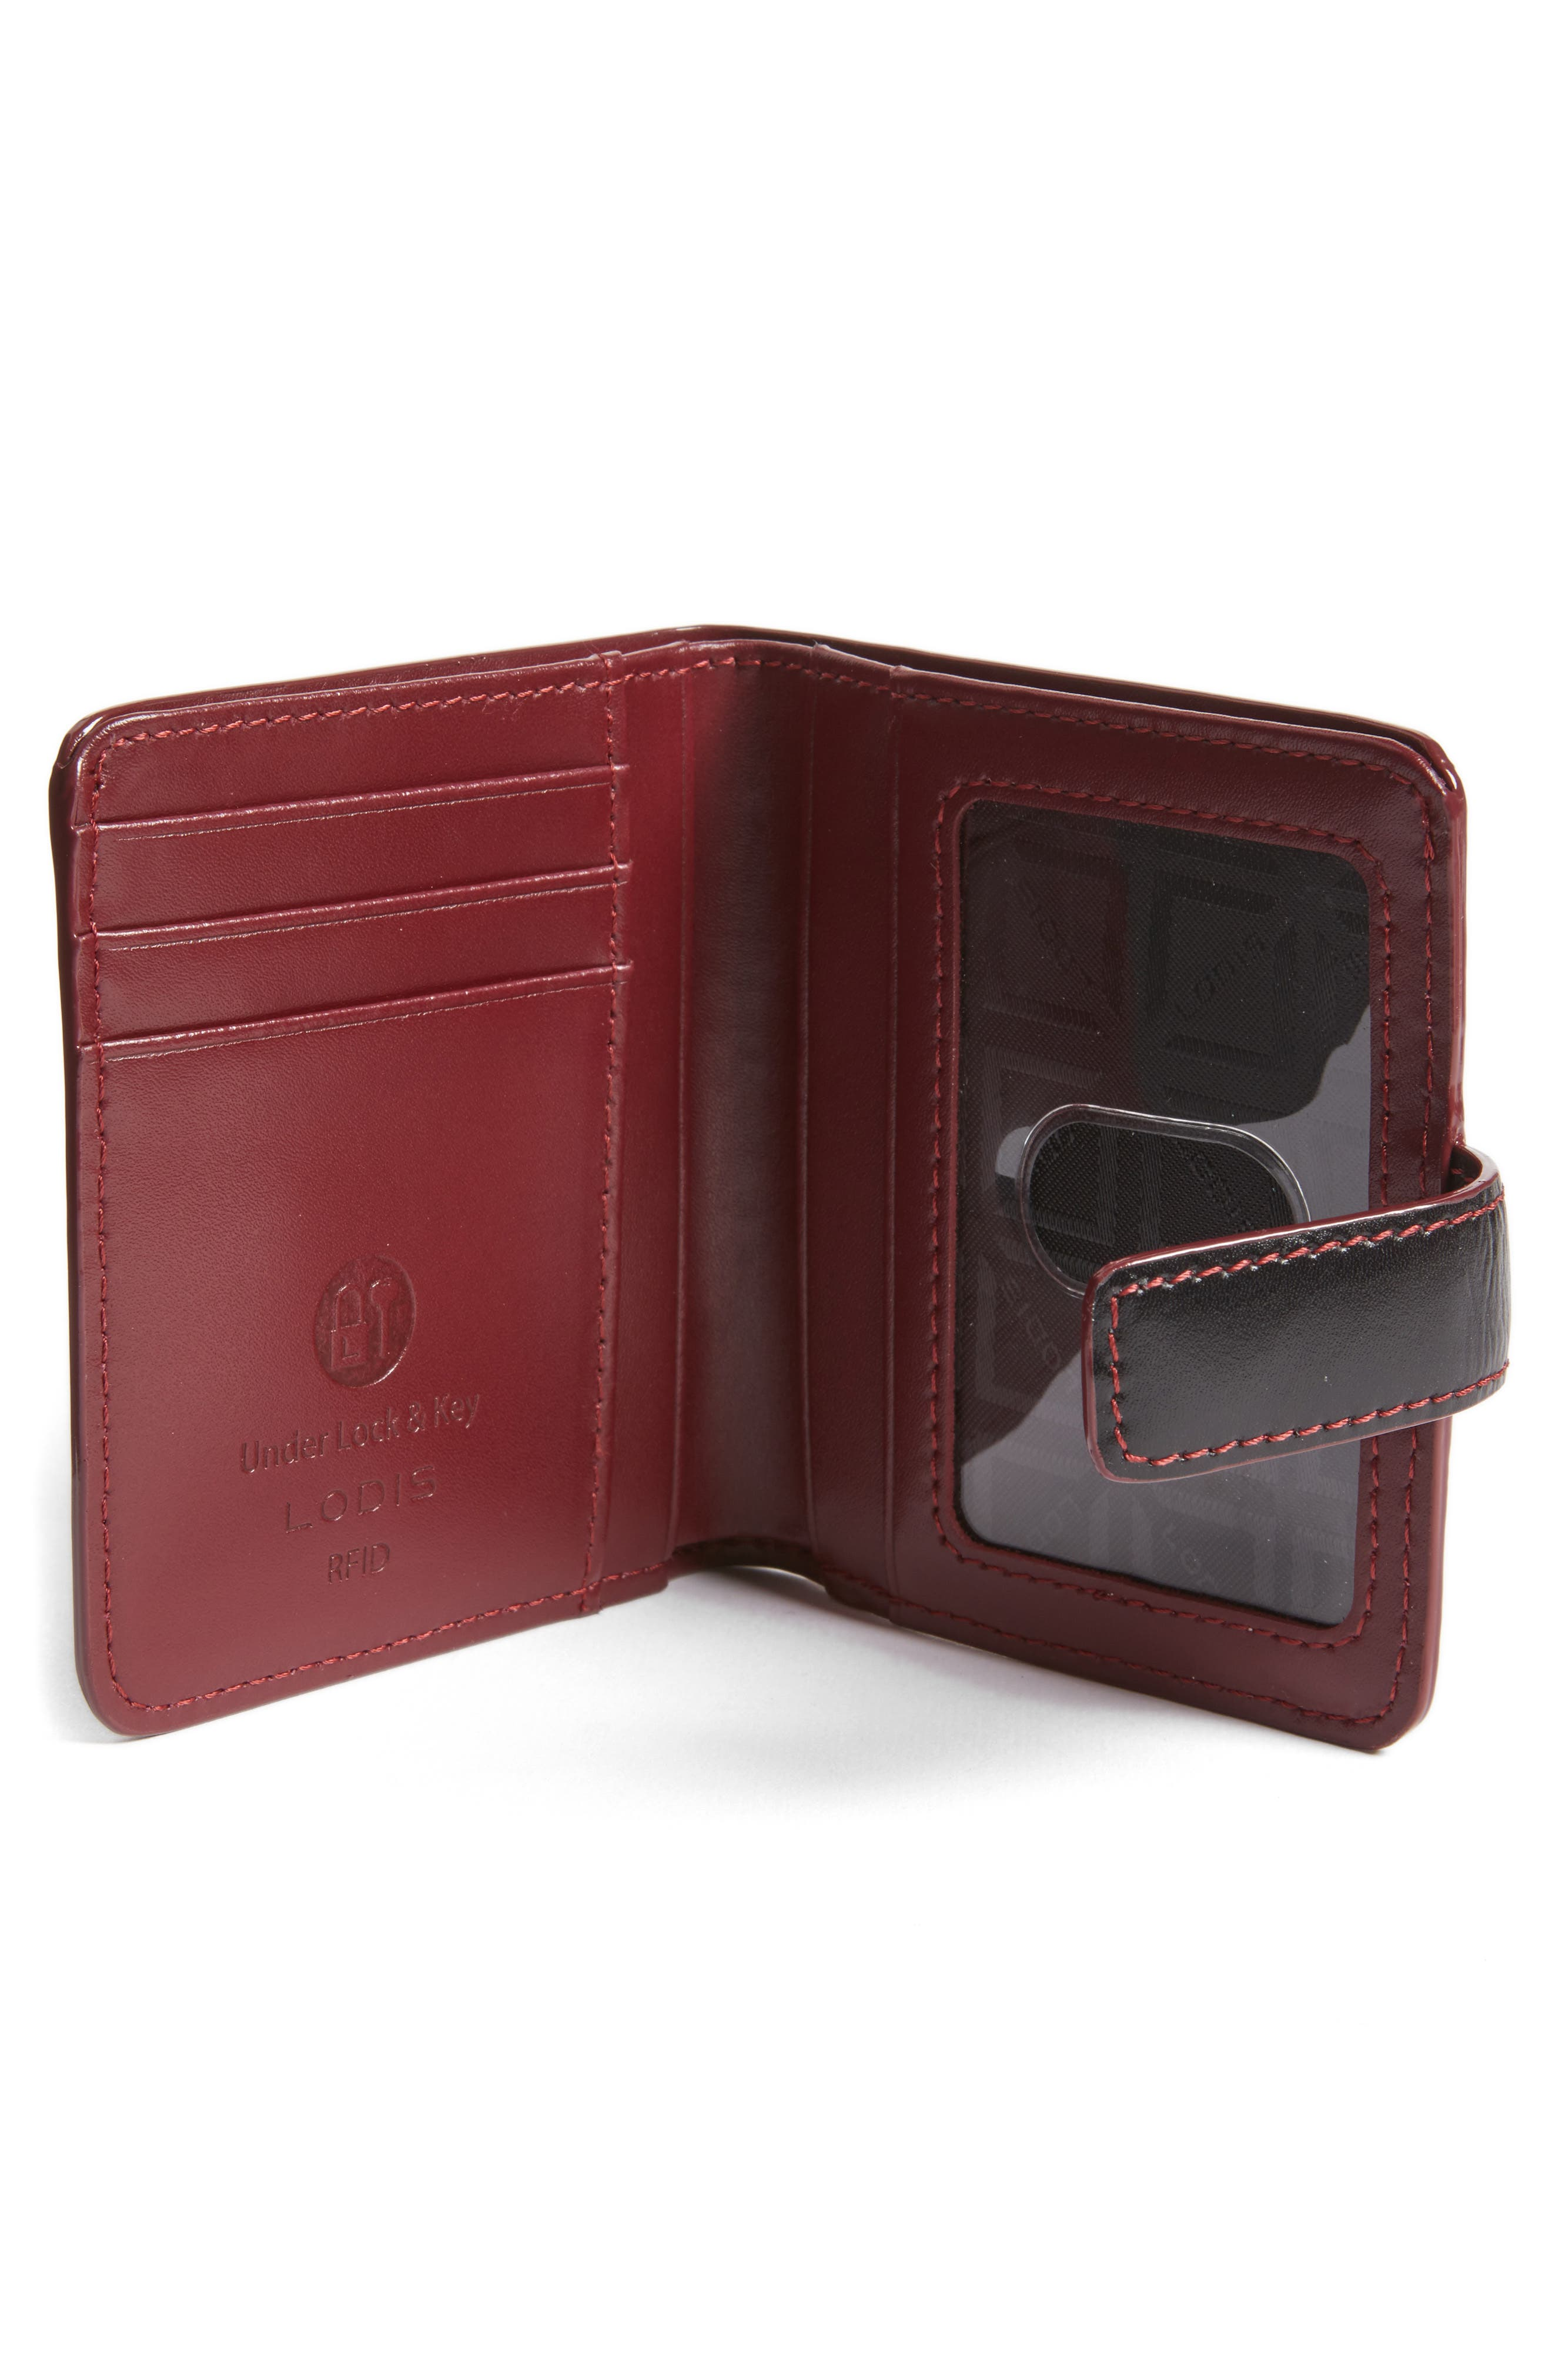 Lodis Petite Audrey RFID Leather Wallet,                             Alternate thumbnail 4, color,